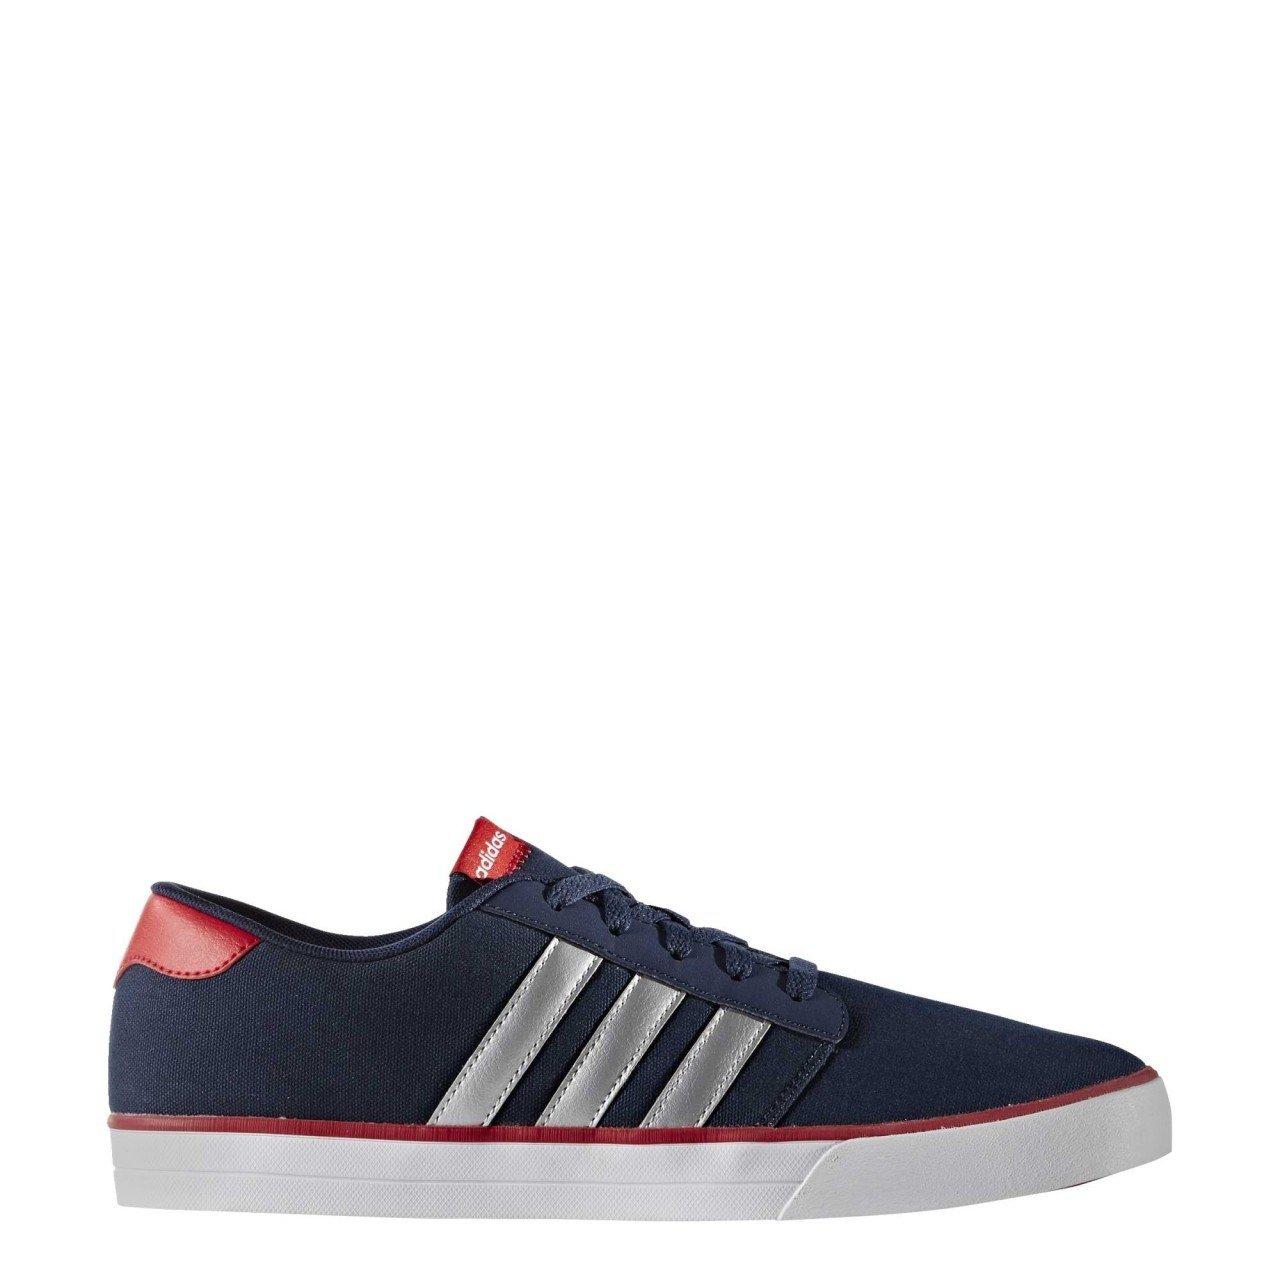 meet e2421 c7bda Adidas Vs Skate, Scarpe da Skateboard Uomo, Blu (Maruni Plamat Escarl), 42  EU  Amazon.it  Scarpe e borse